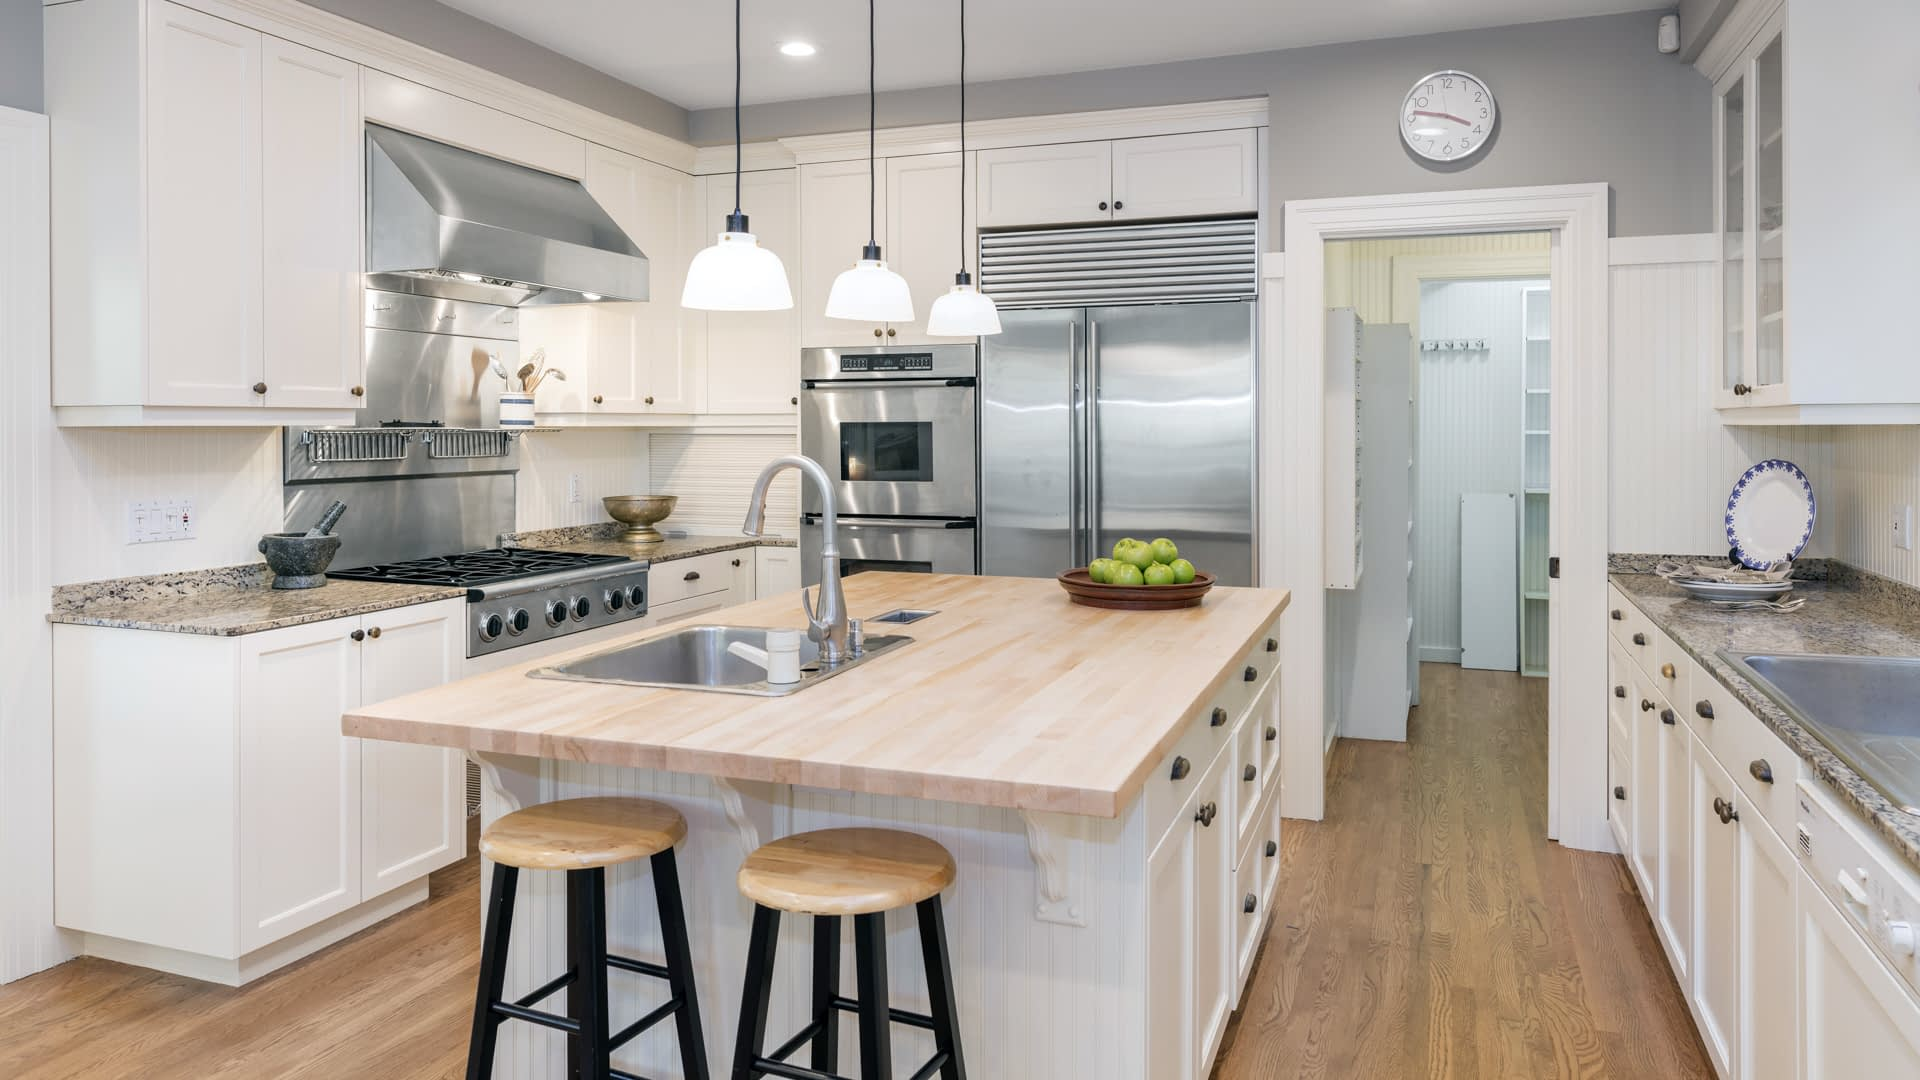 Luxury Kitchen Interior in white with wooden floor and kitchen i